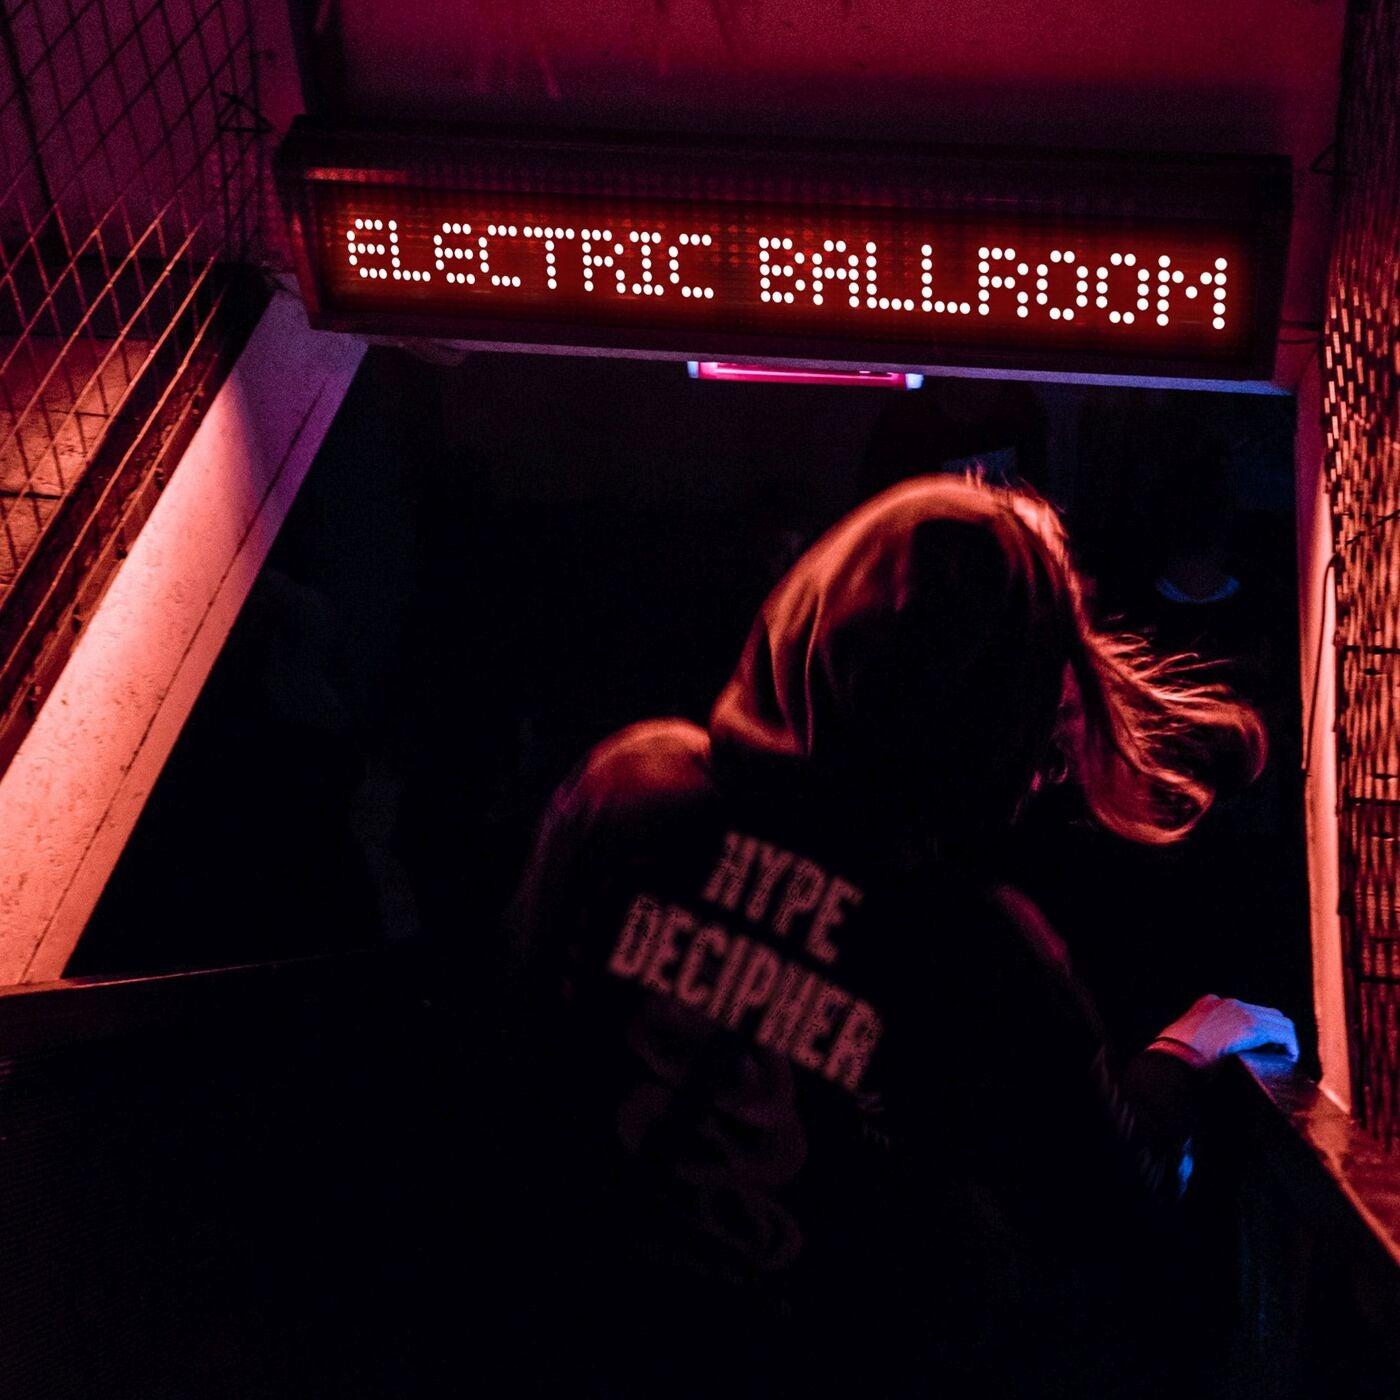 Hype (DJ Tool)